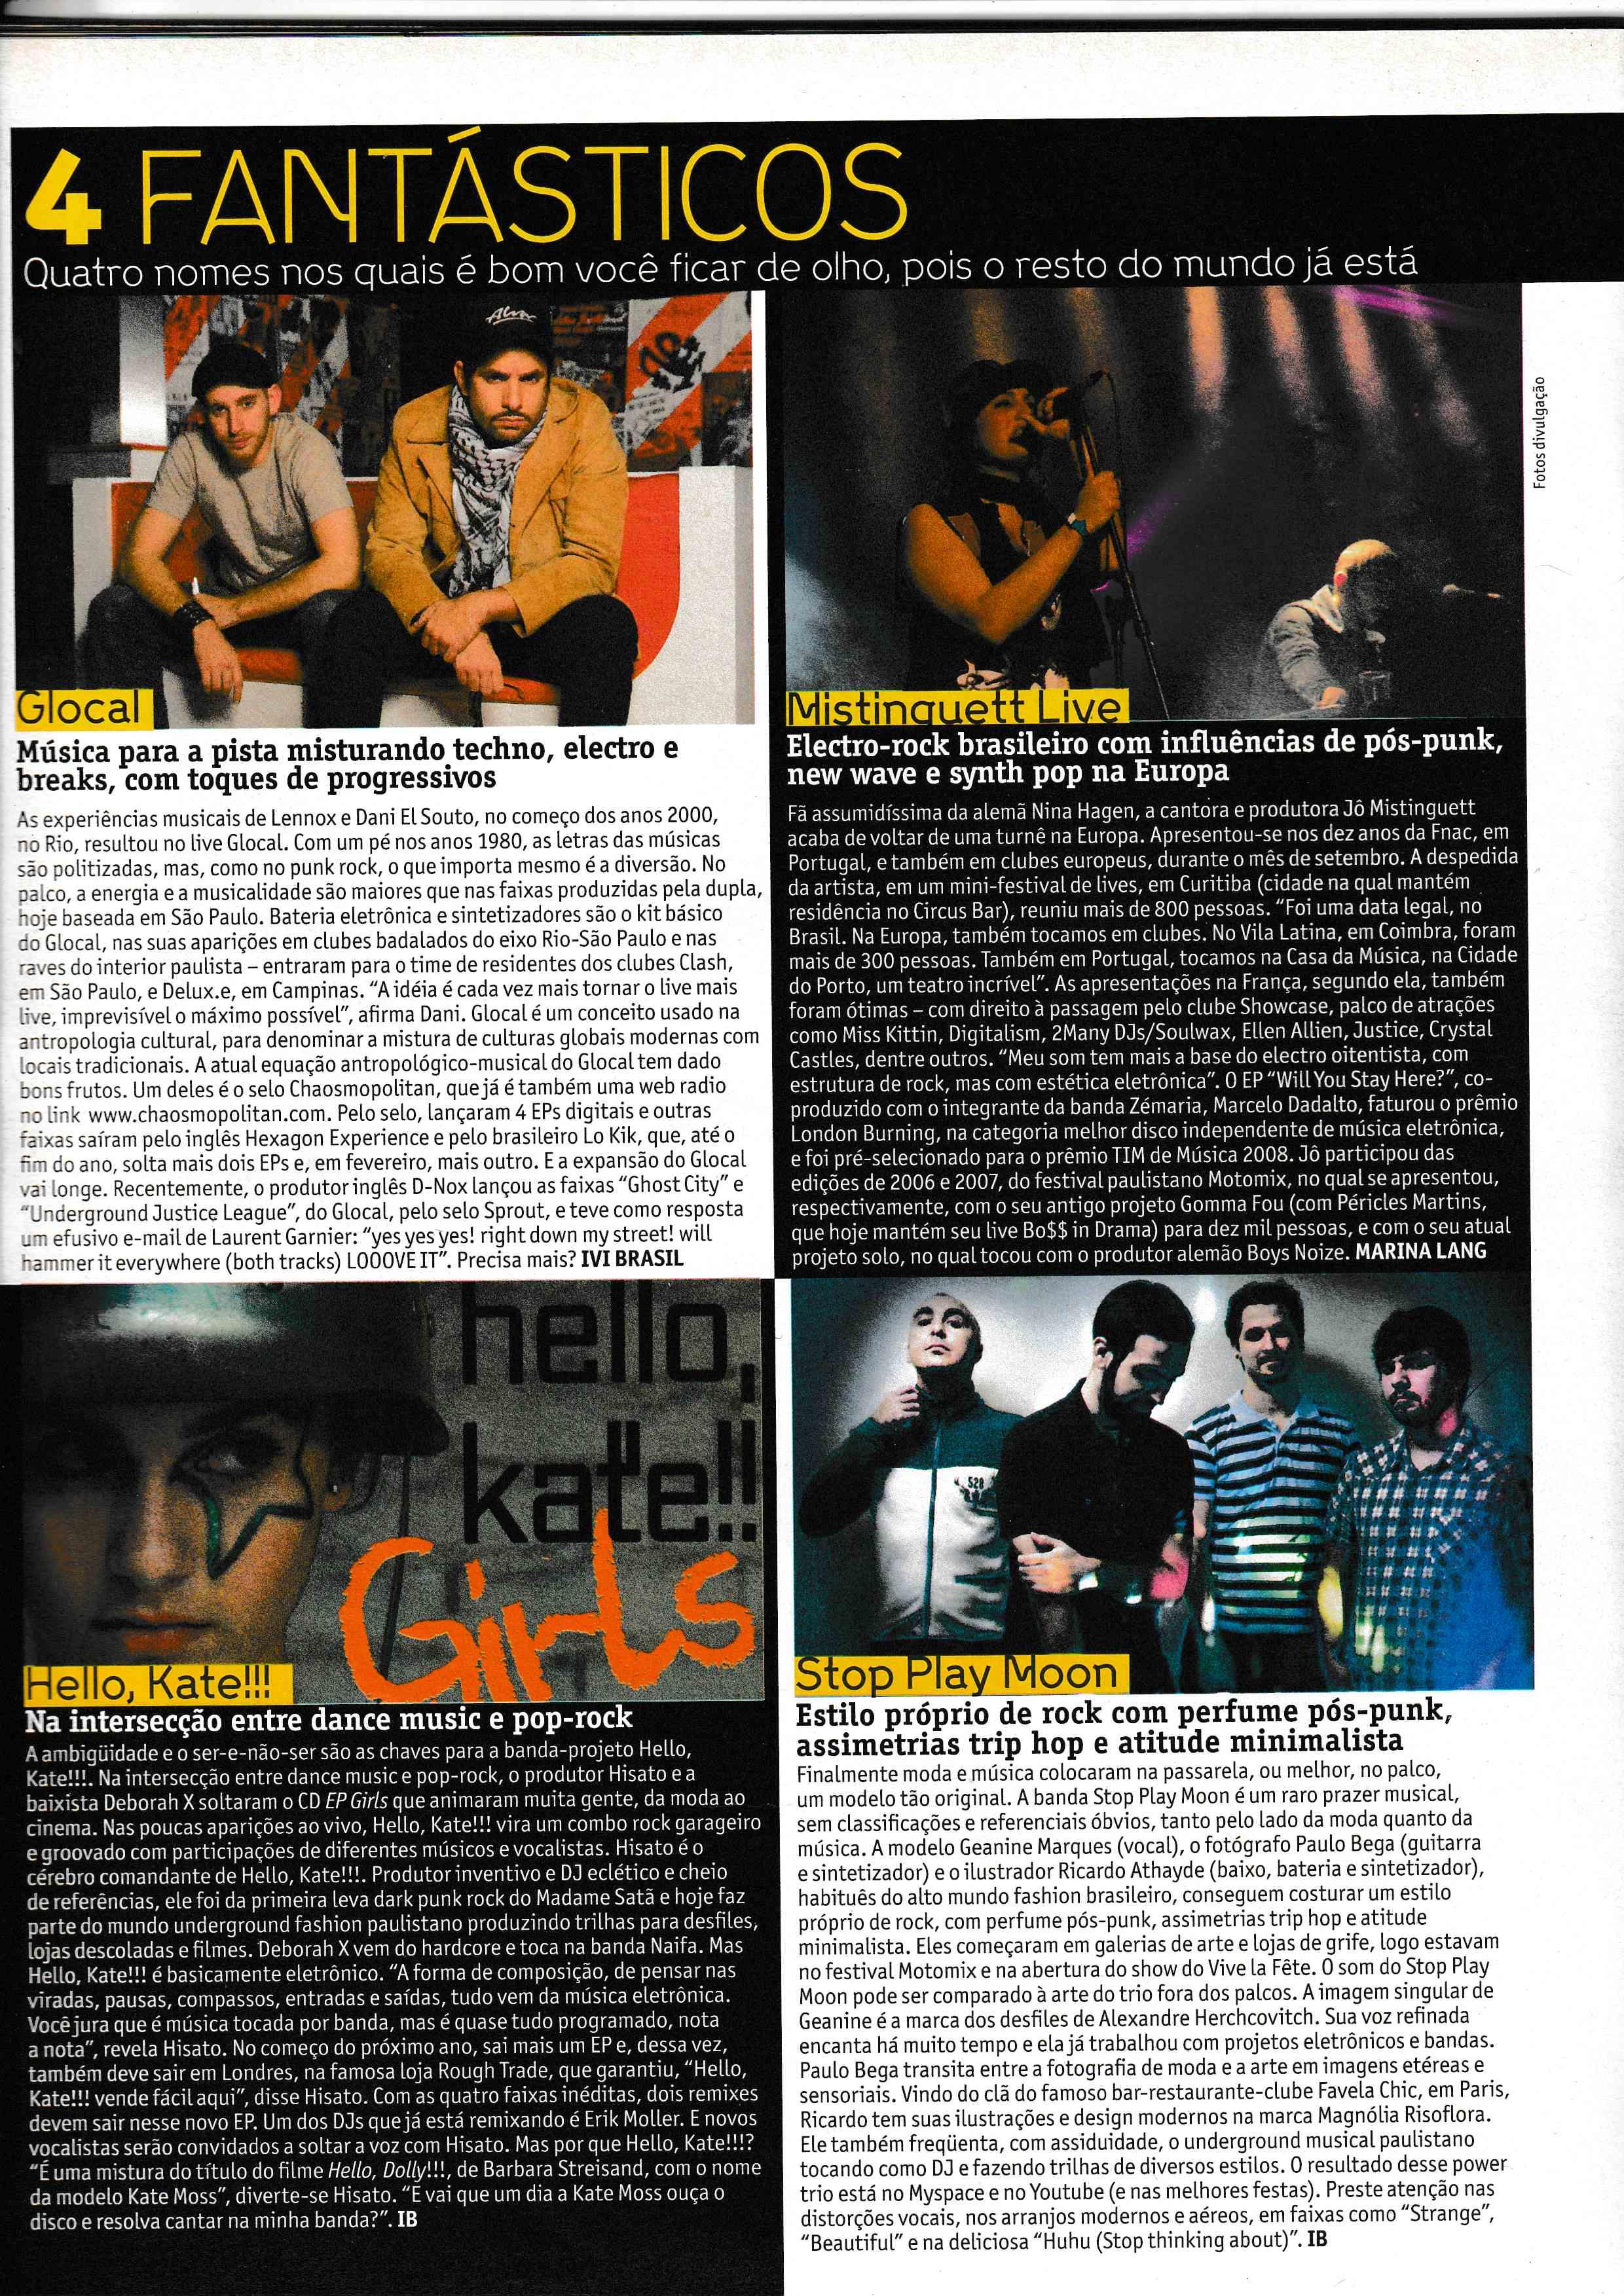 Dj Mag 2008